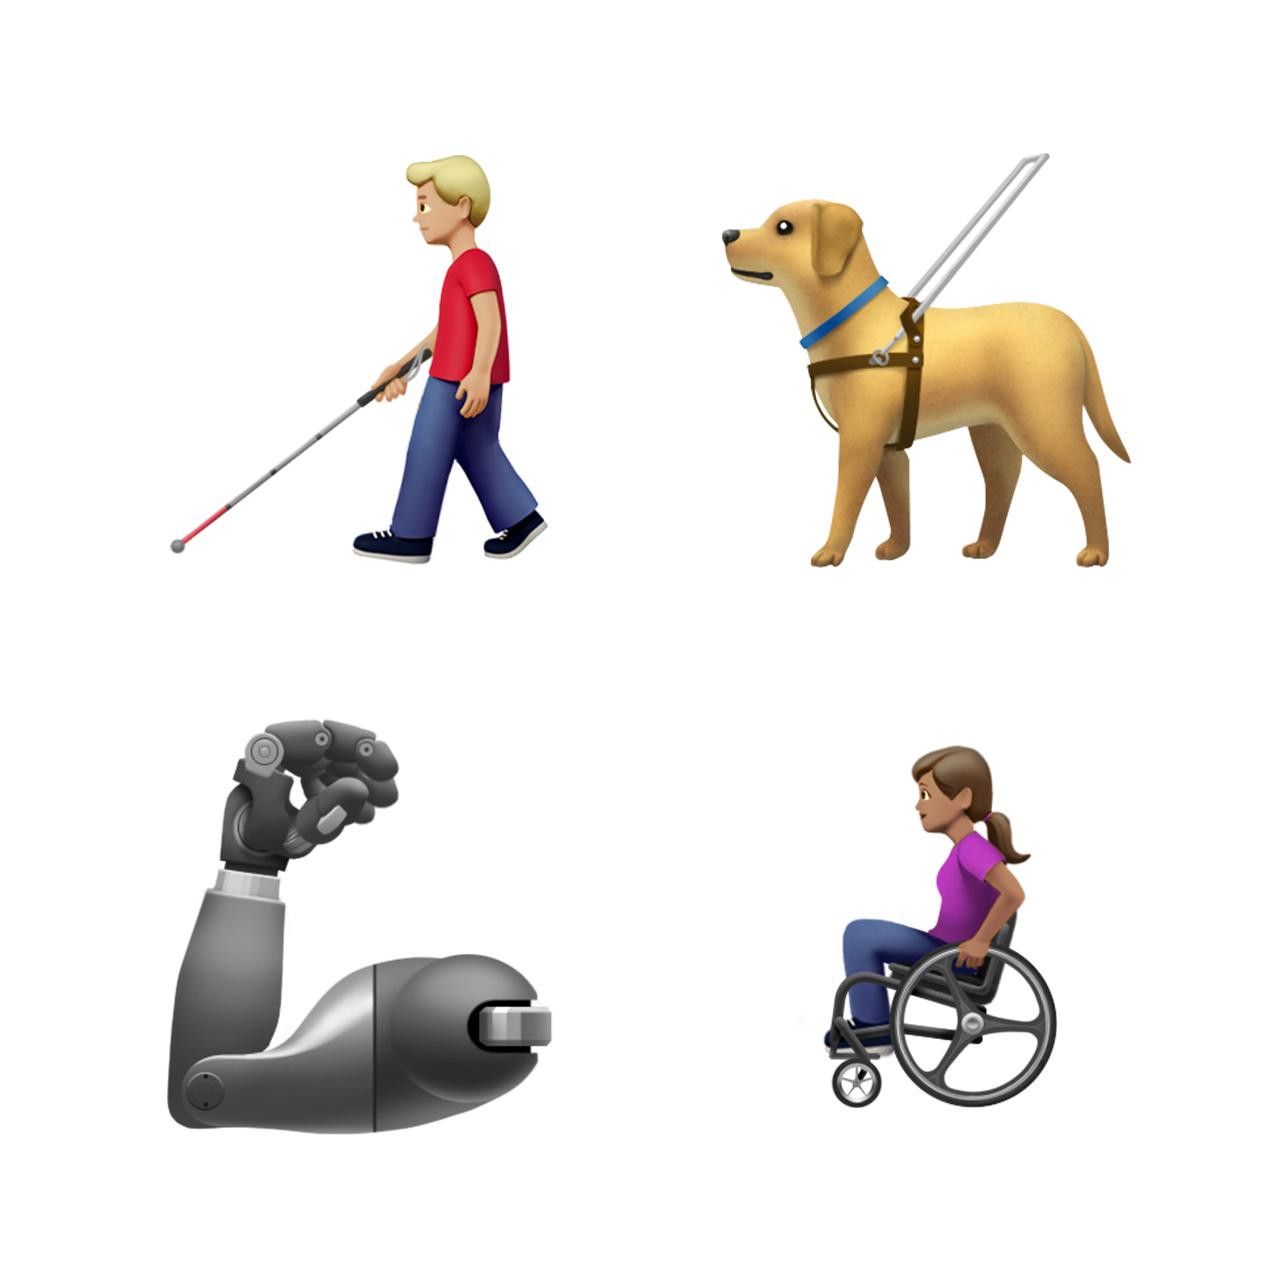 apple_emoji-day_disability-arm-dog_071619_5d306ede44729.jpg